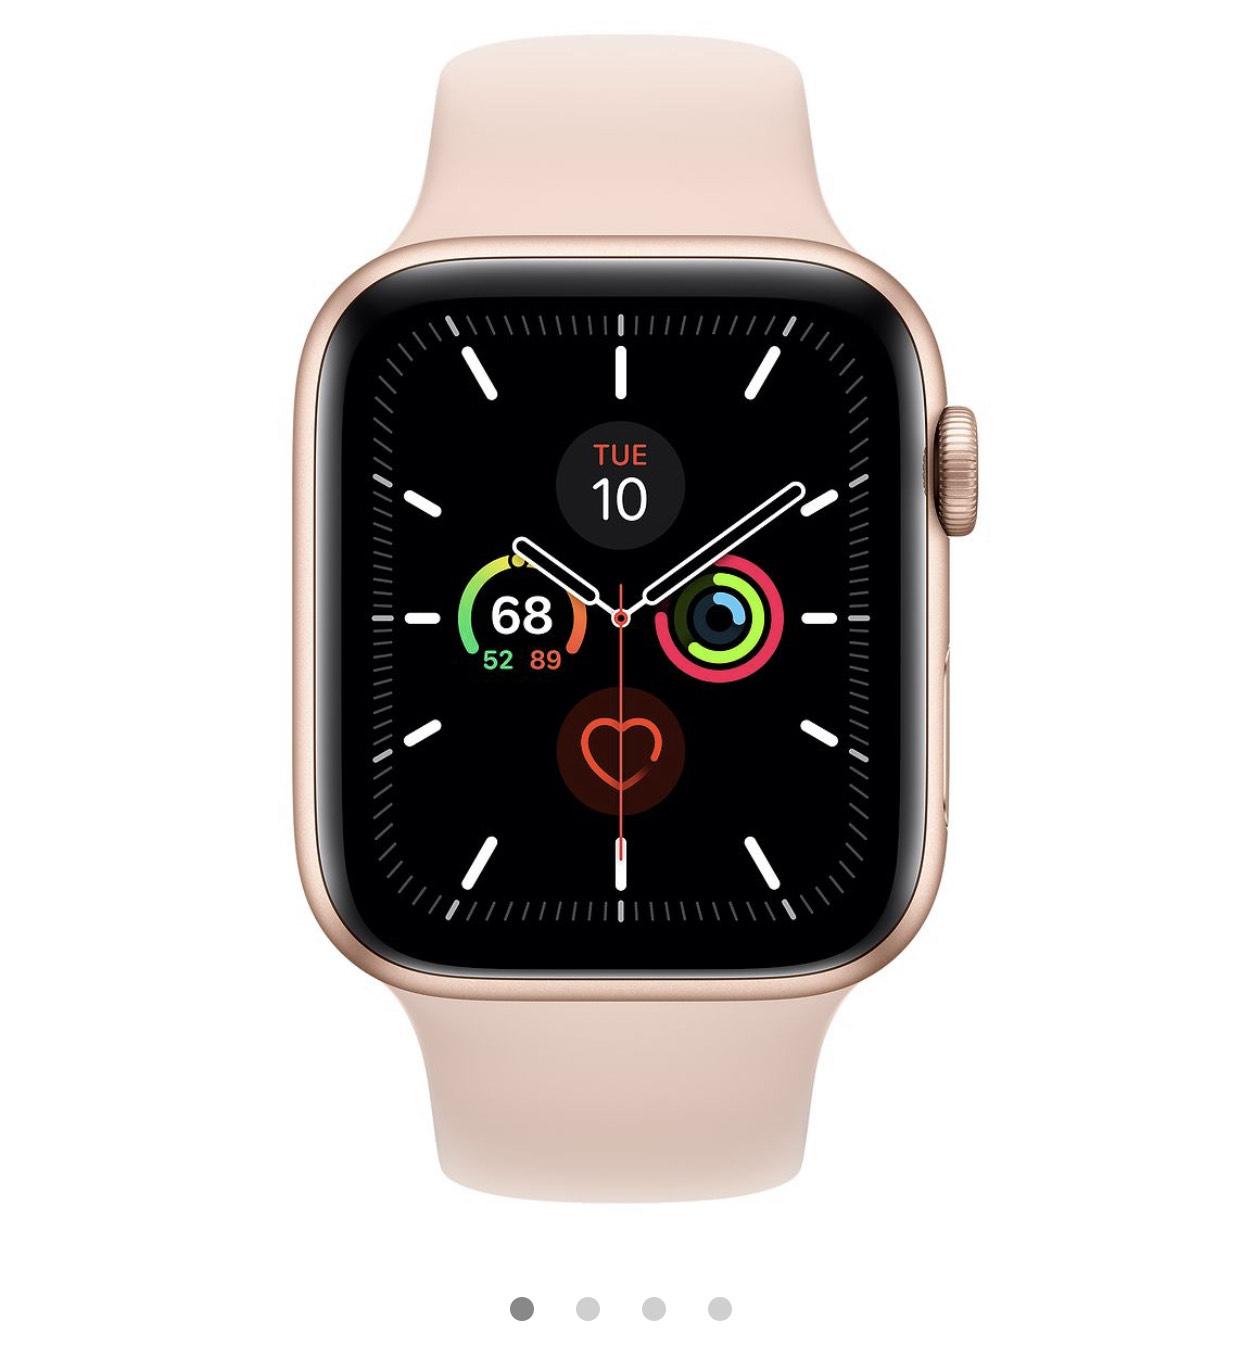 Refurbished Apple Watch series 5 (GPS + Cellular) - £449 @ Apple Store